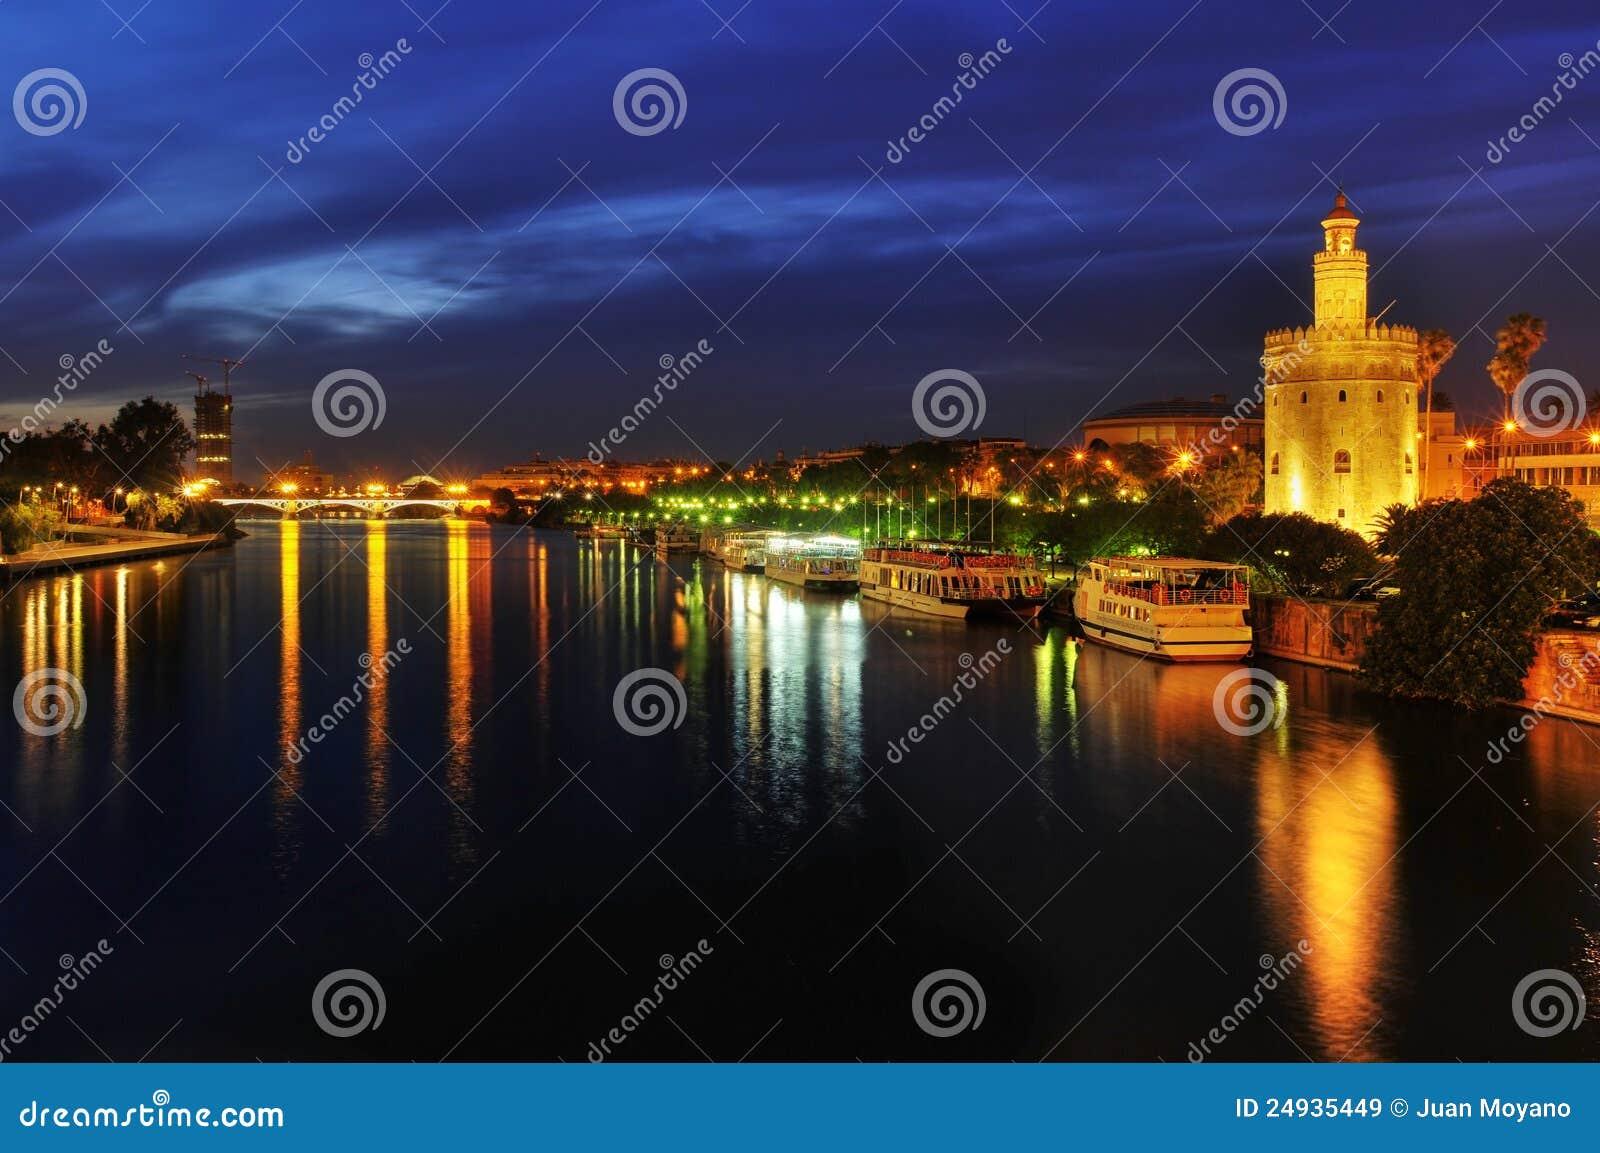 Guadalquivir River and the Torre del Oro in Sevile